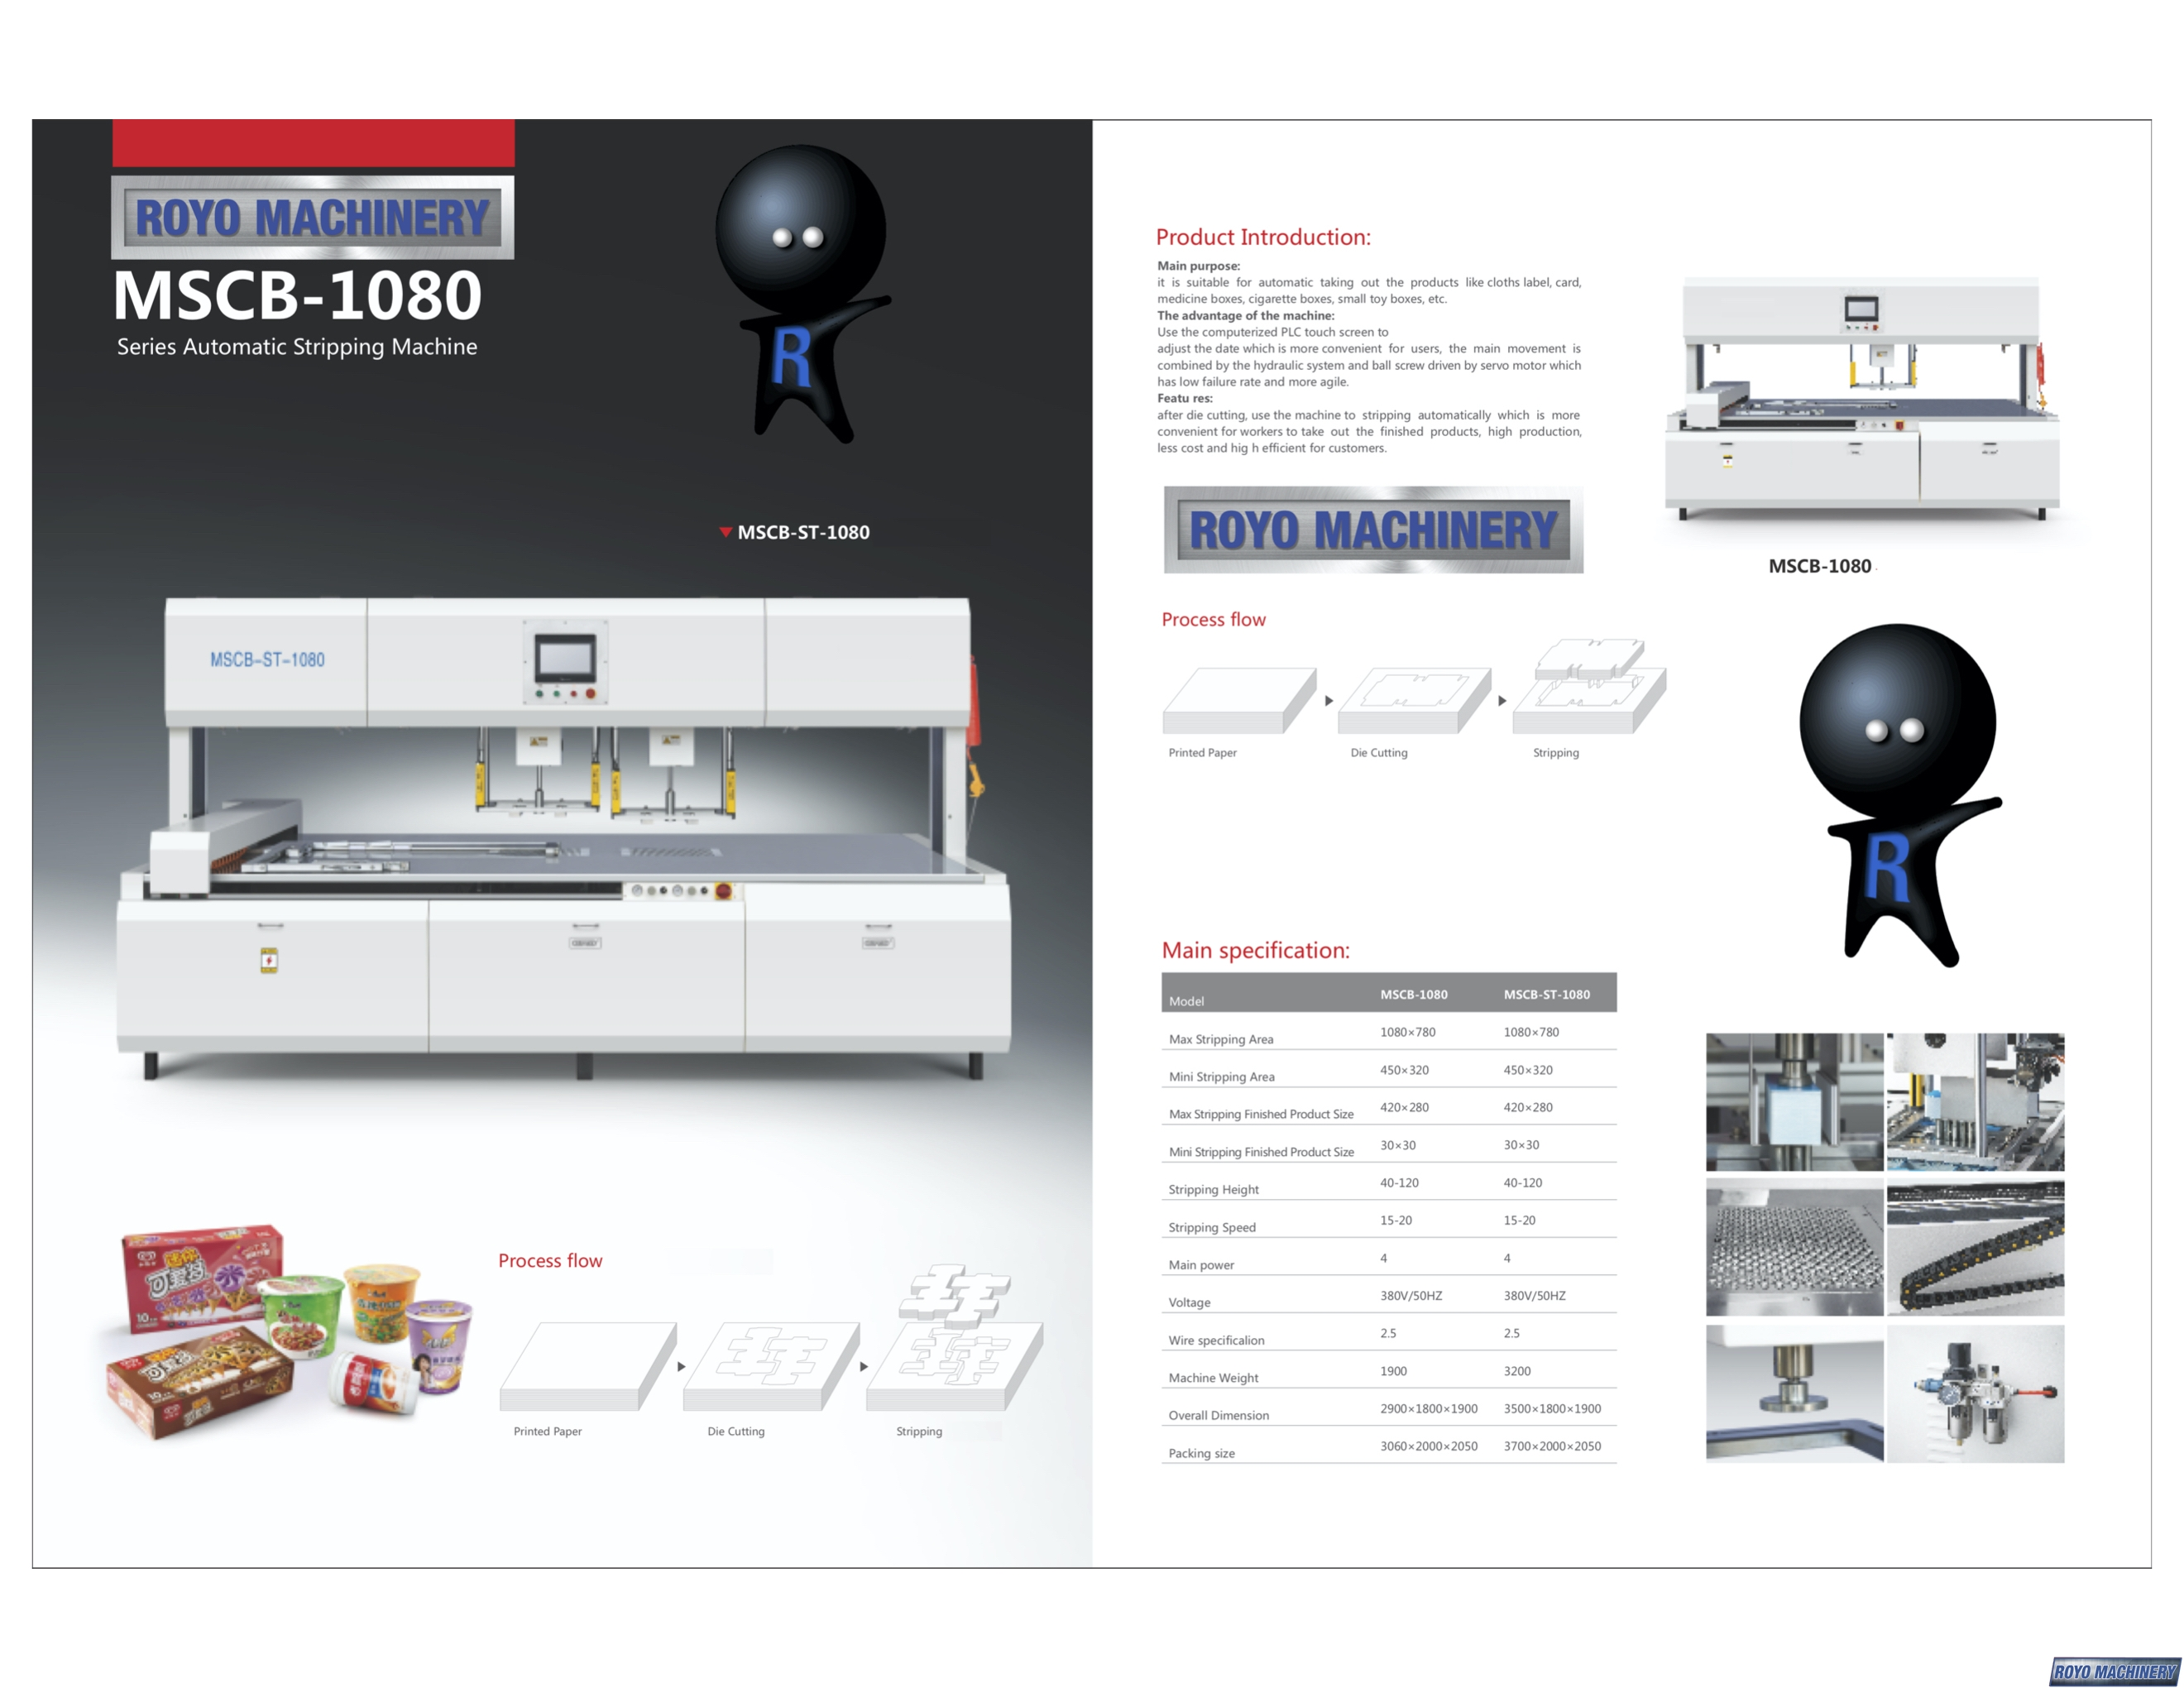 Royo Machinery RMSCB-1300